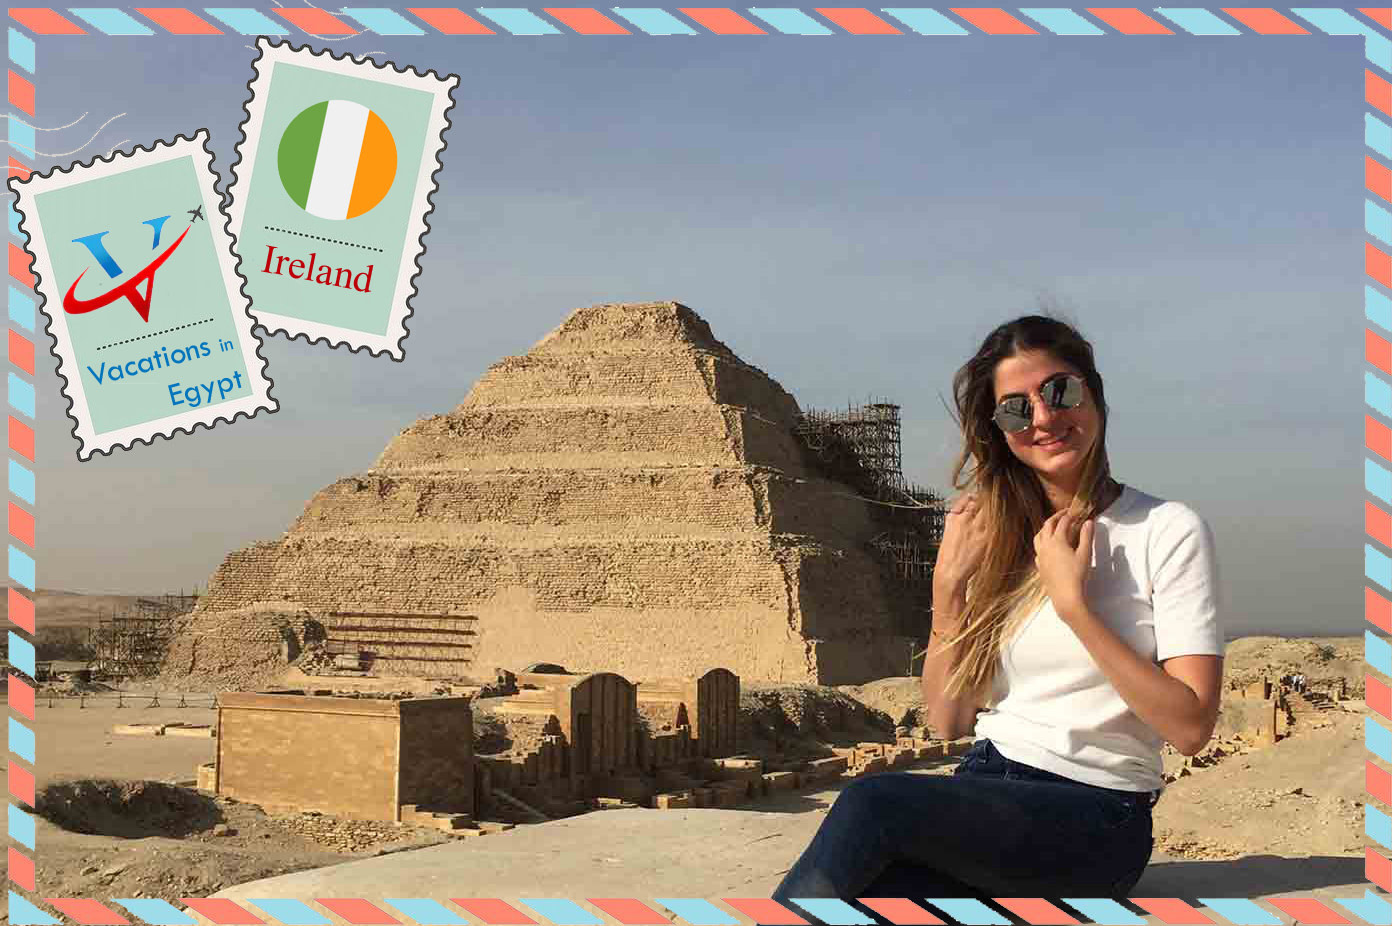 Egypt holidays from Ireland